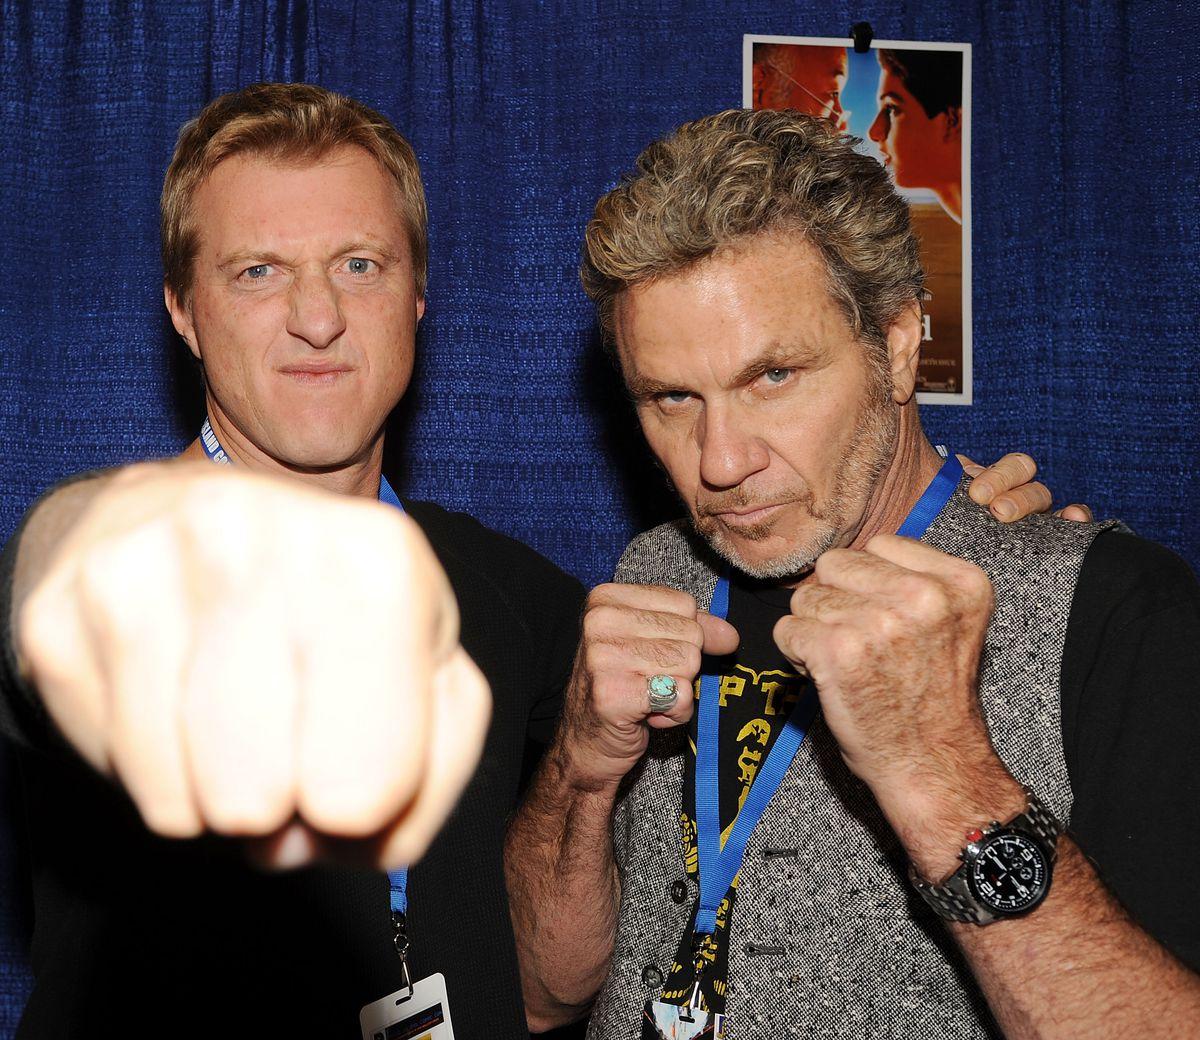 2013 Rhode Island Comic Con - Day 1